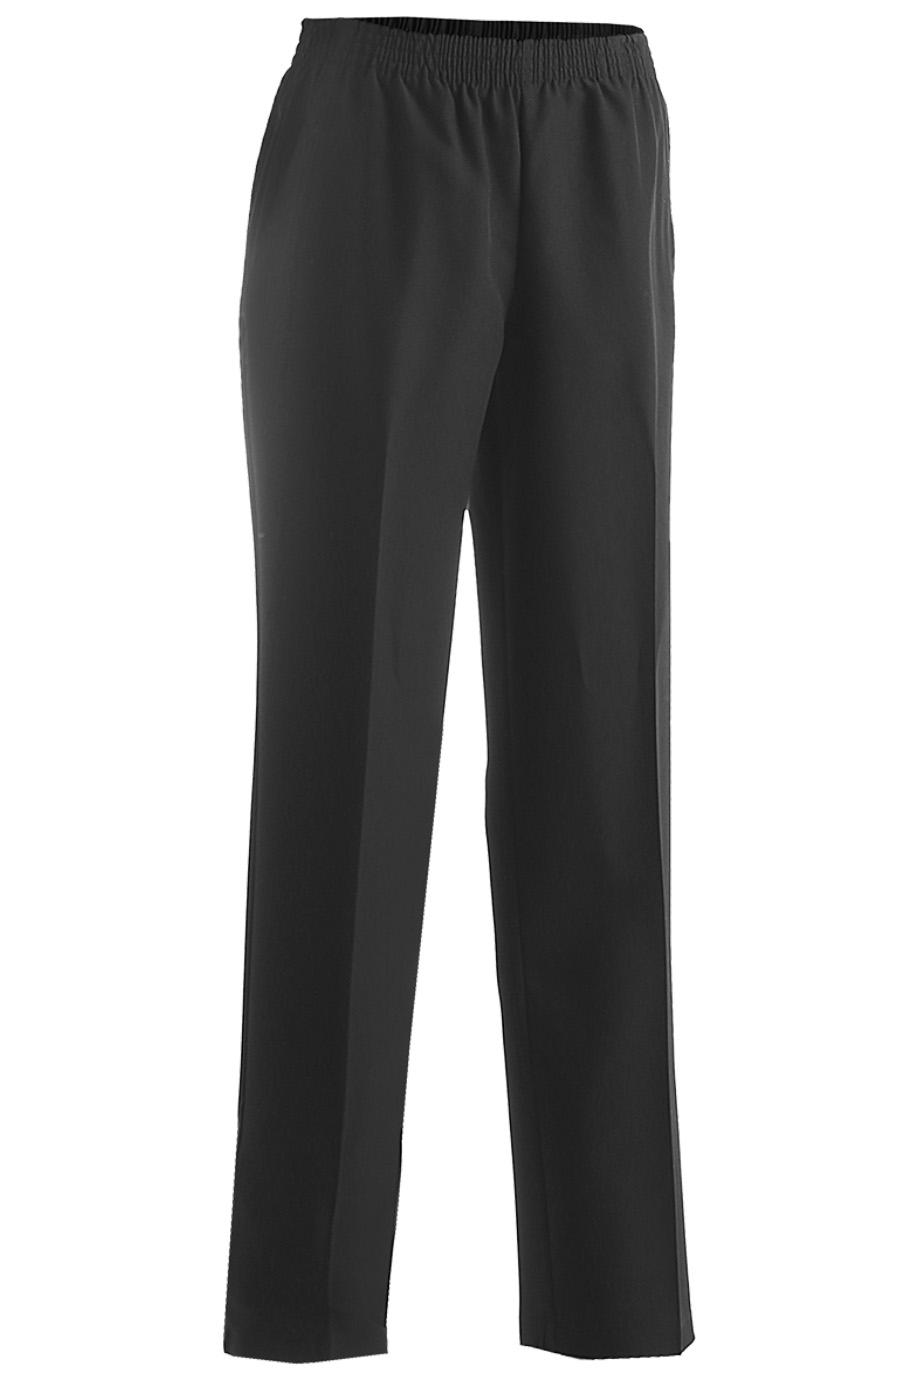 Edwards Ladies Polyester Pull-On Pant-Edwards